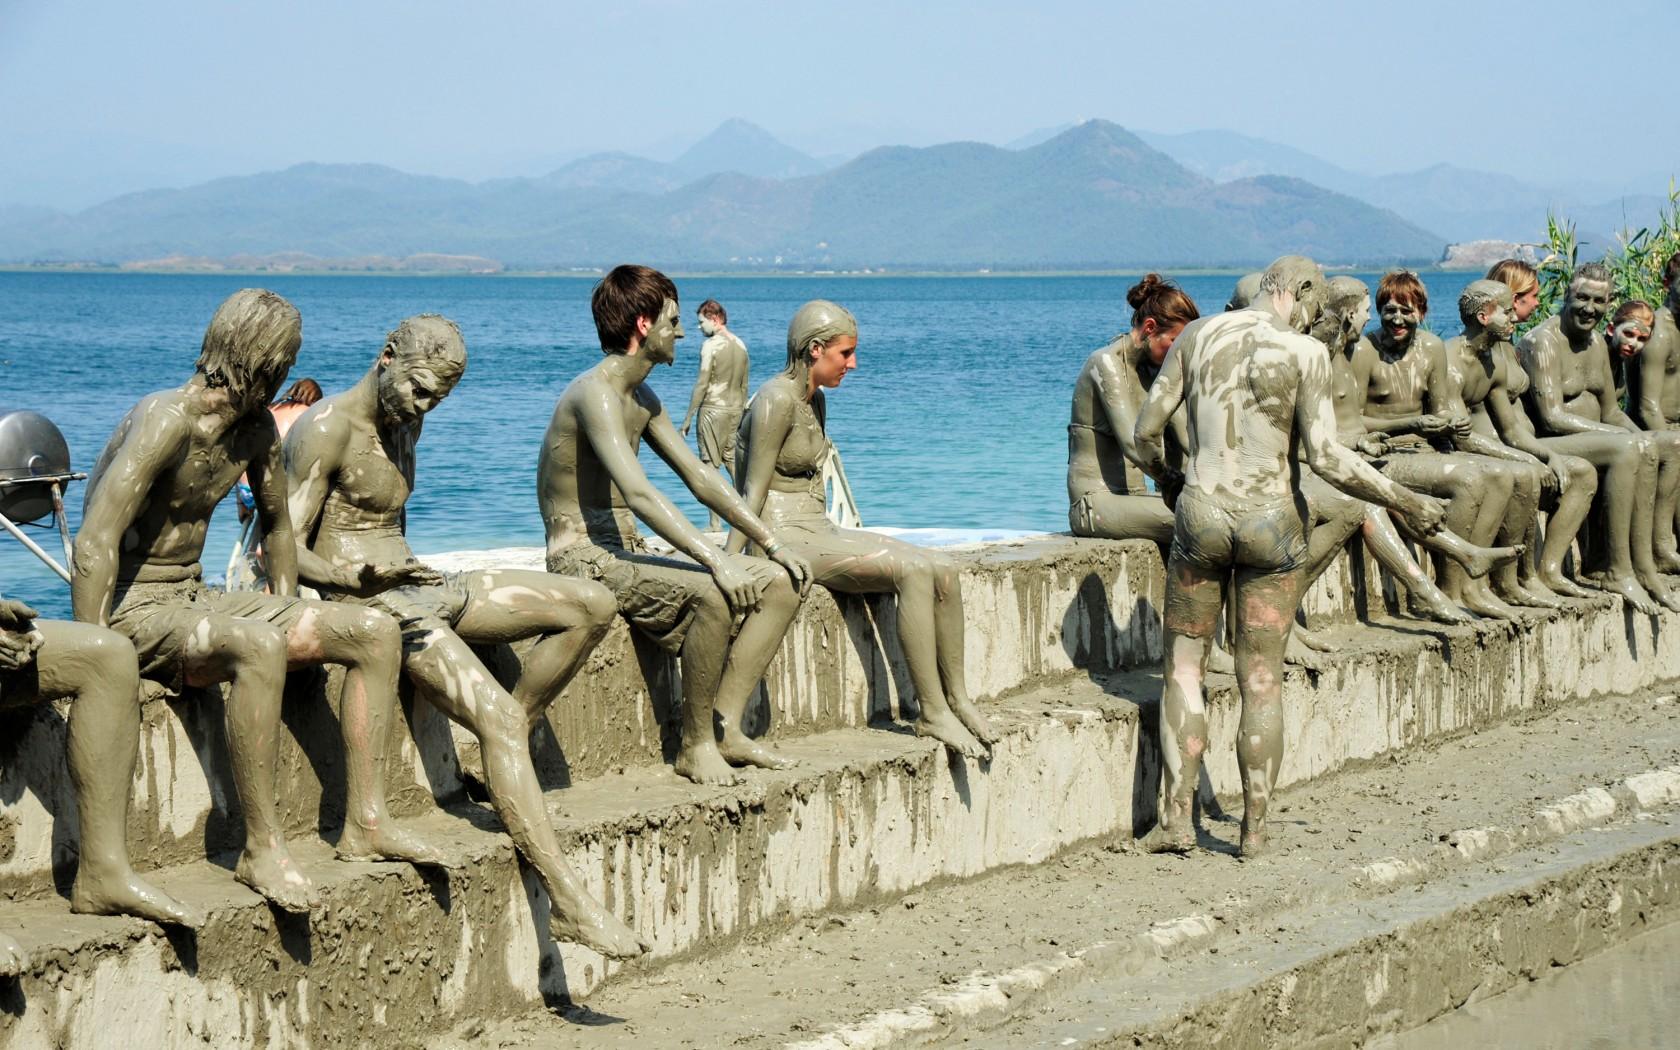 Турция лишилась 16,5% прибыли от туризма